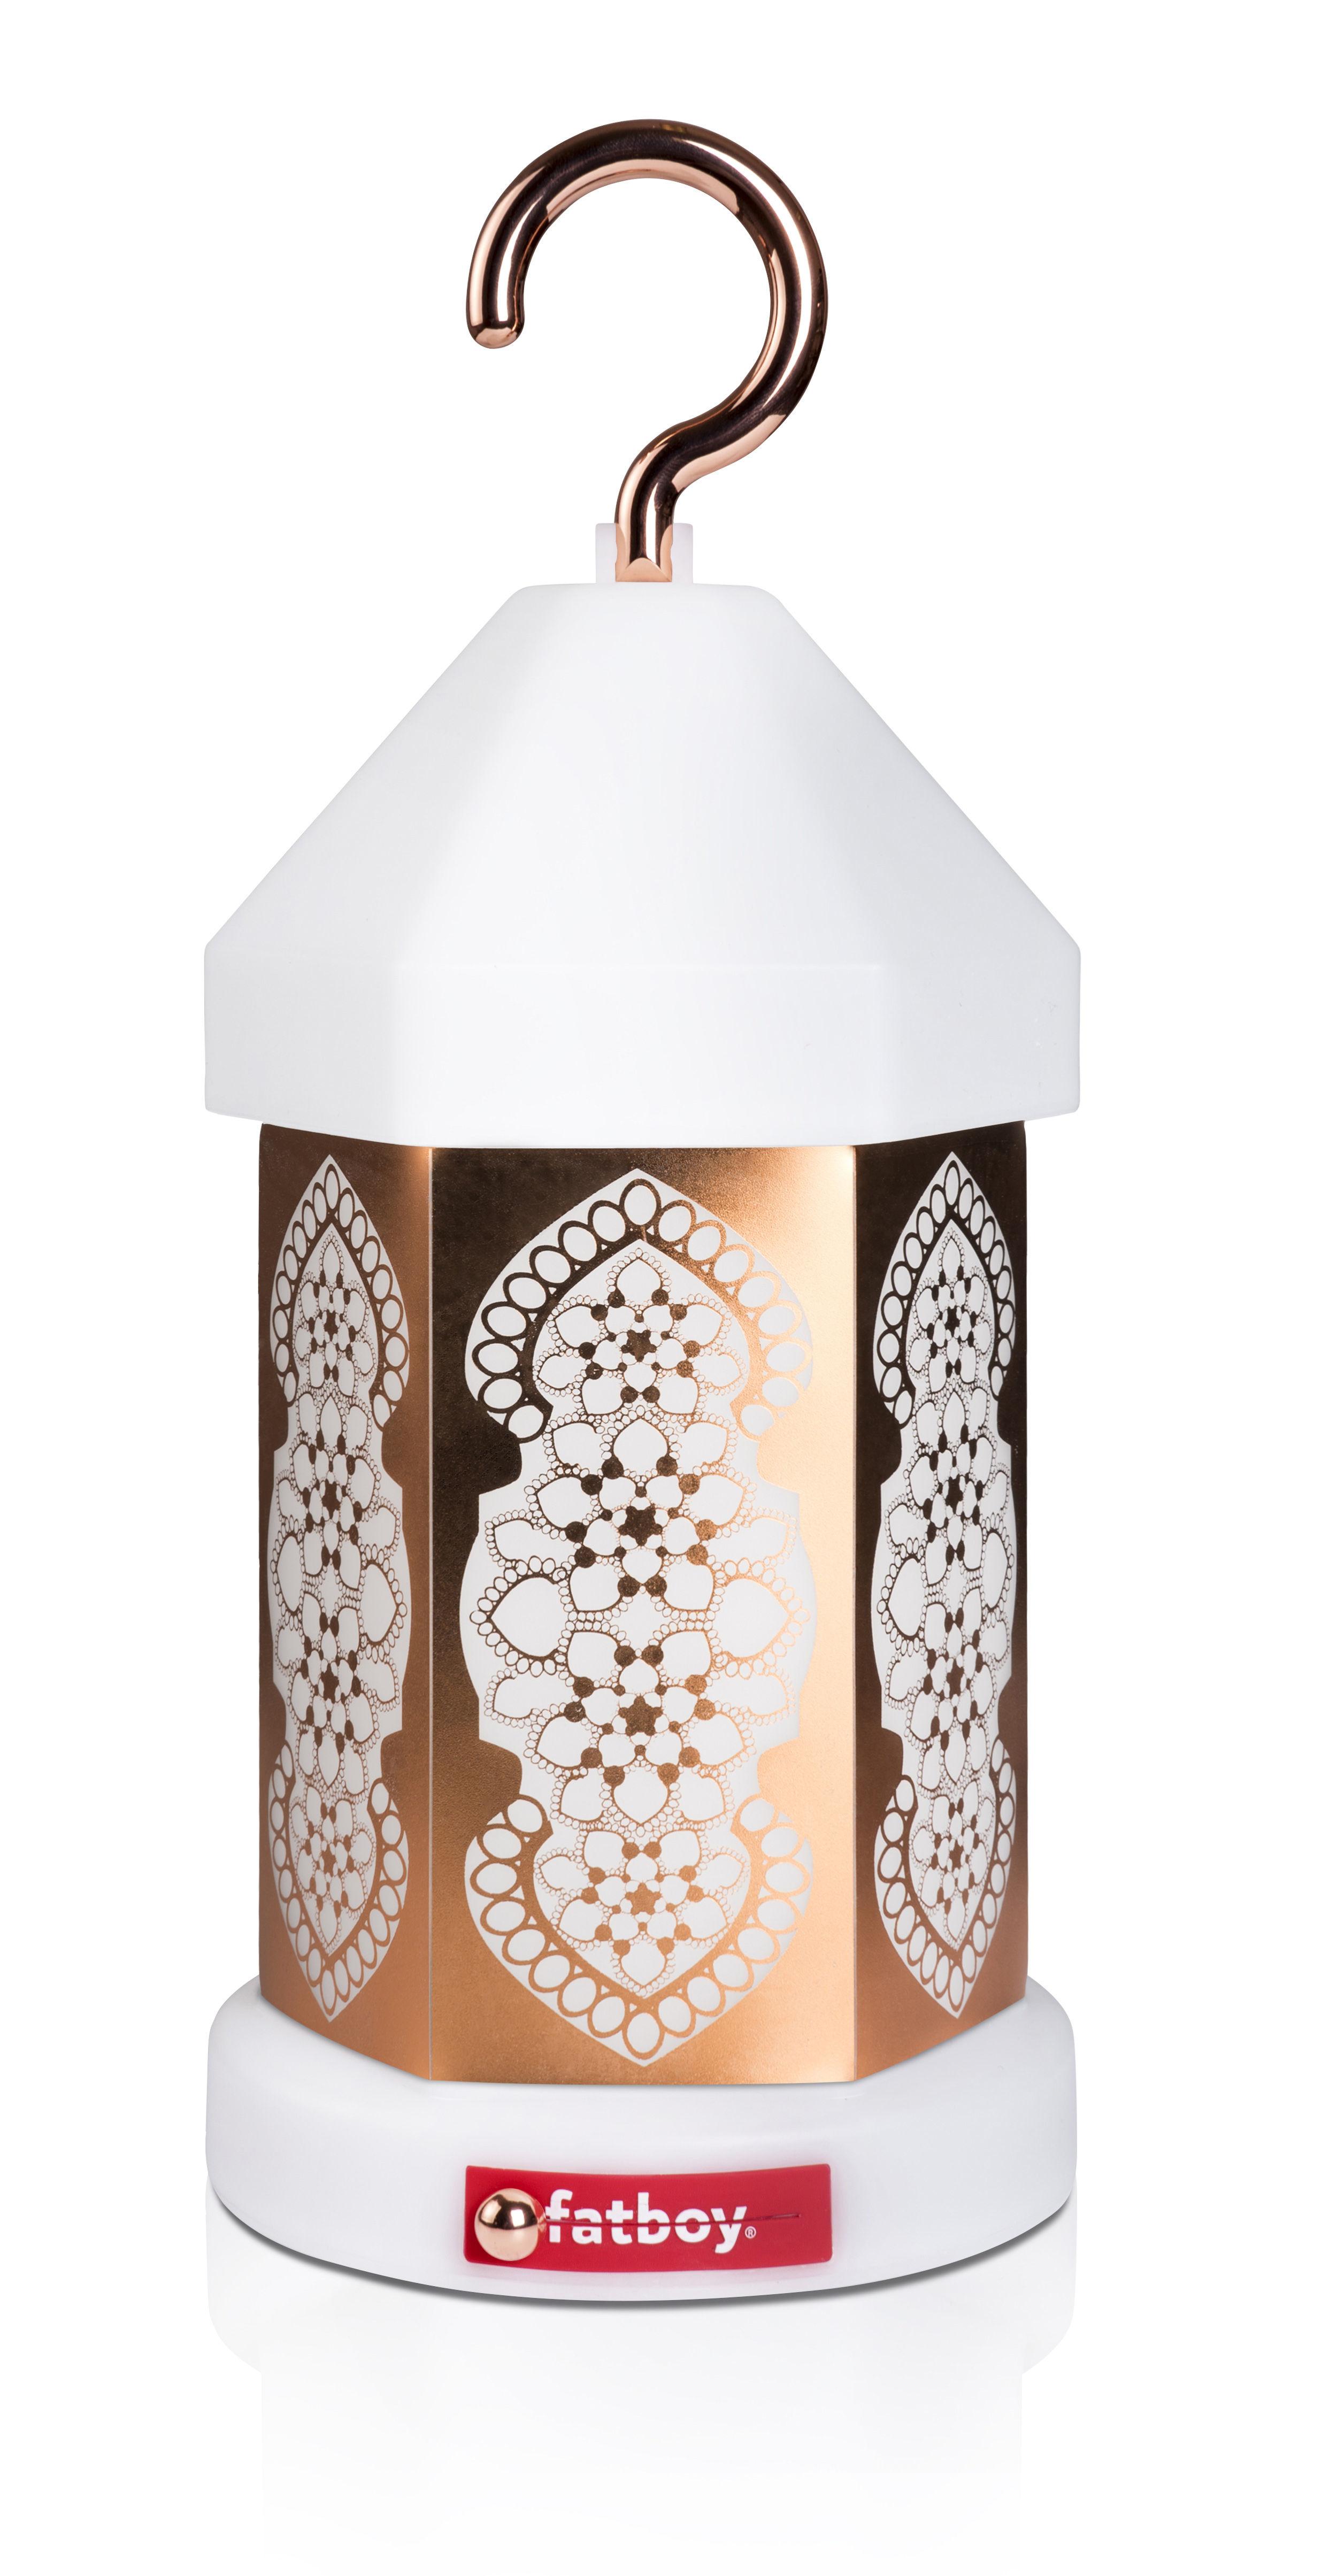 lampe ohne kabel lampie on deluxe von fatboy wei made. Black Bedroom Furniture Sets. Home Design Ideas